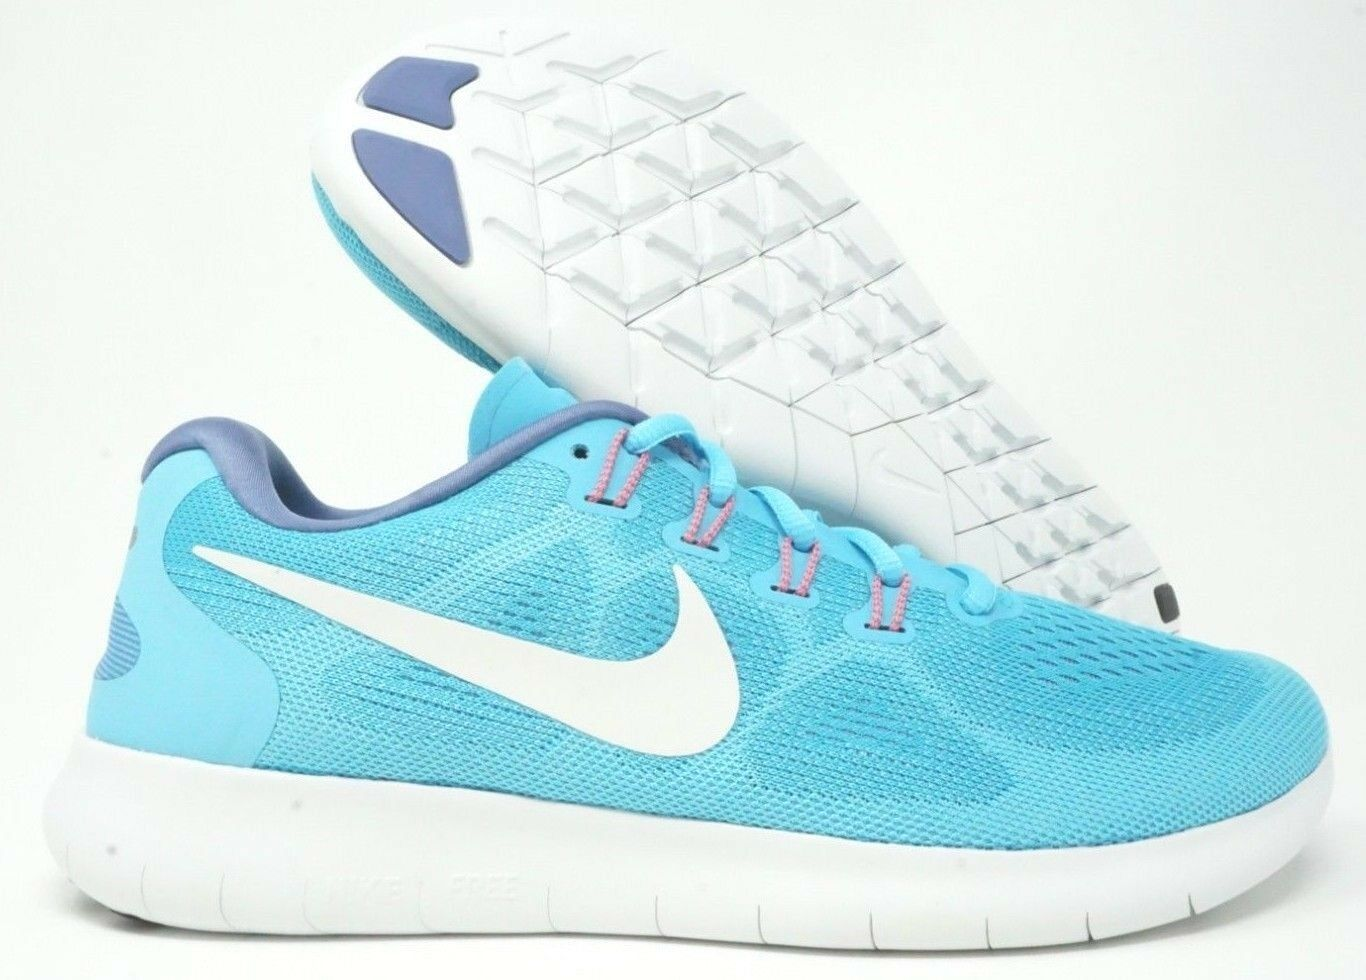 Nike kvinnor Free RN RN RN 2017 springaning skor blå vit Storlek 7.5  sälja som heta kakor